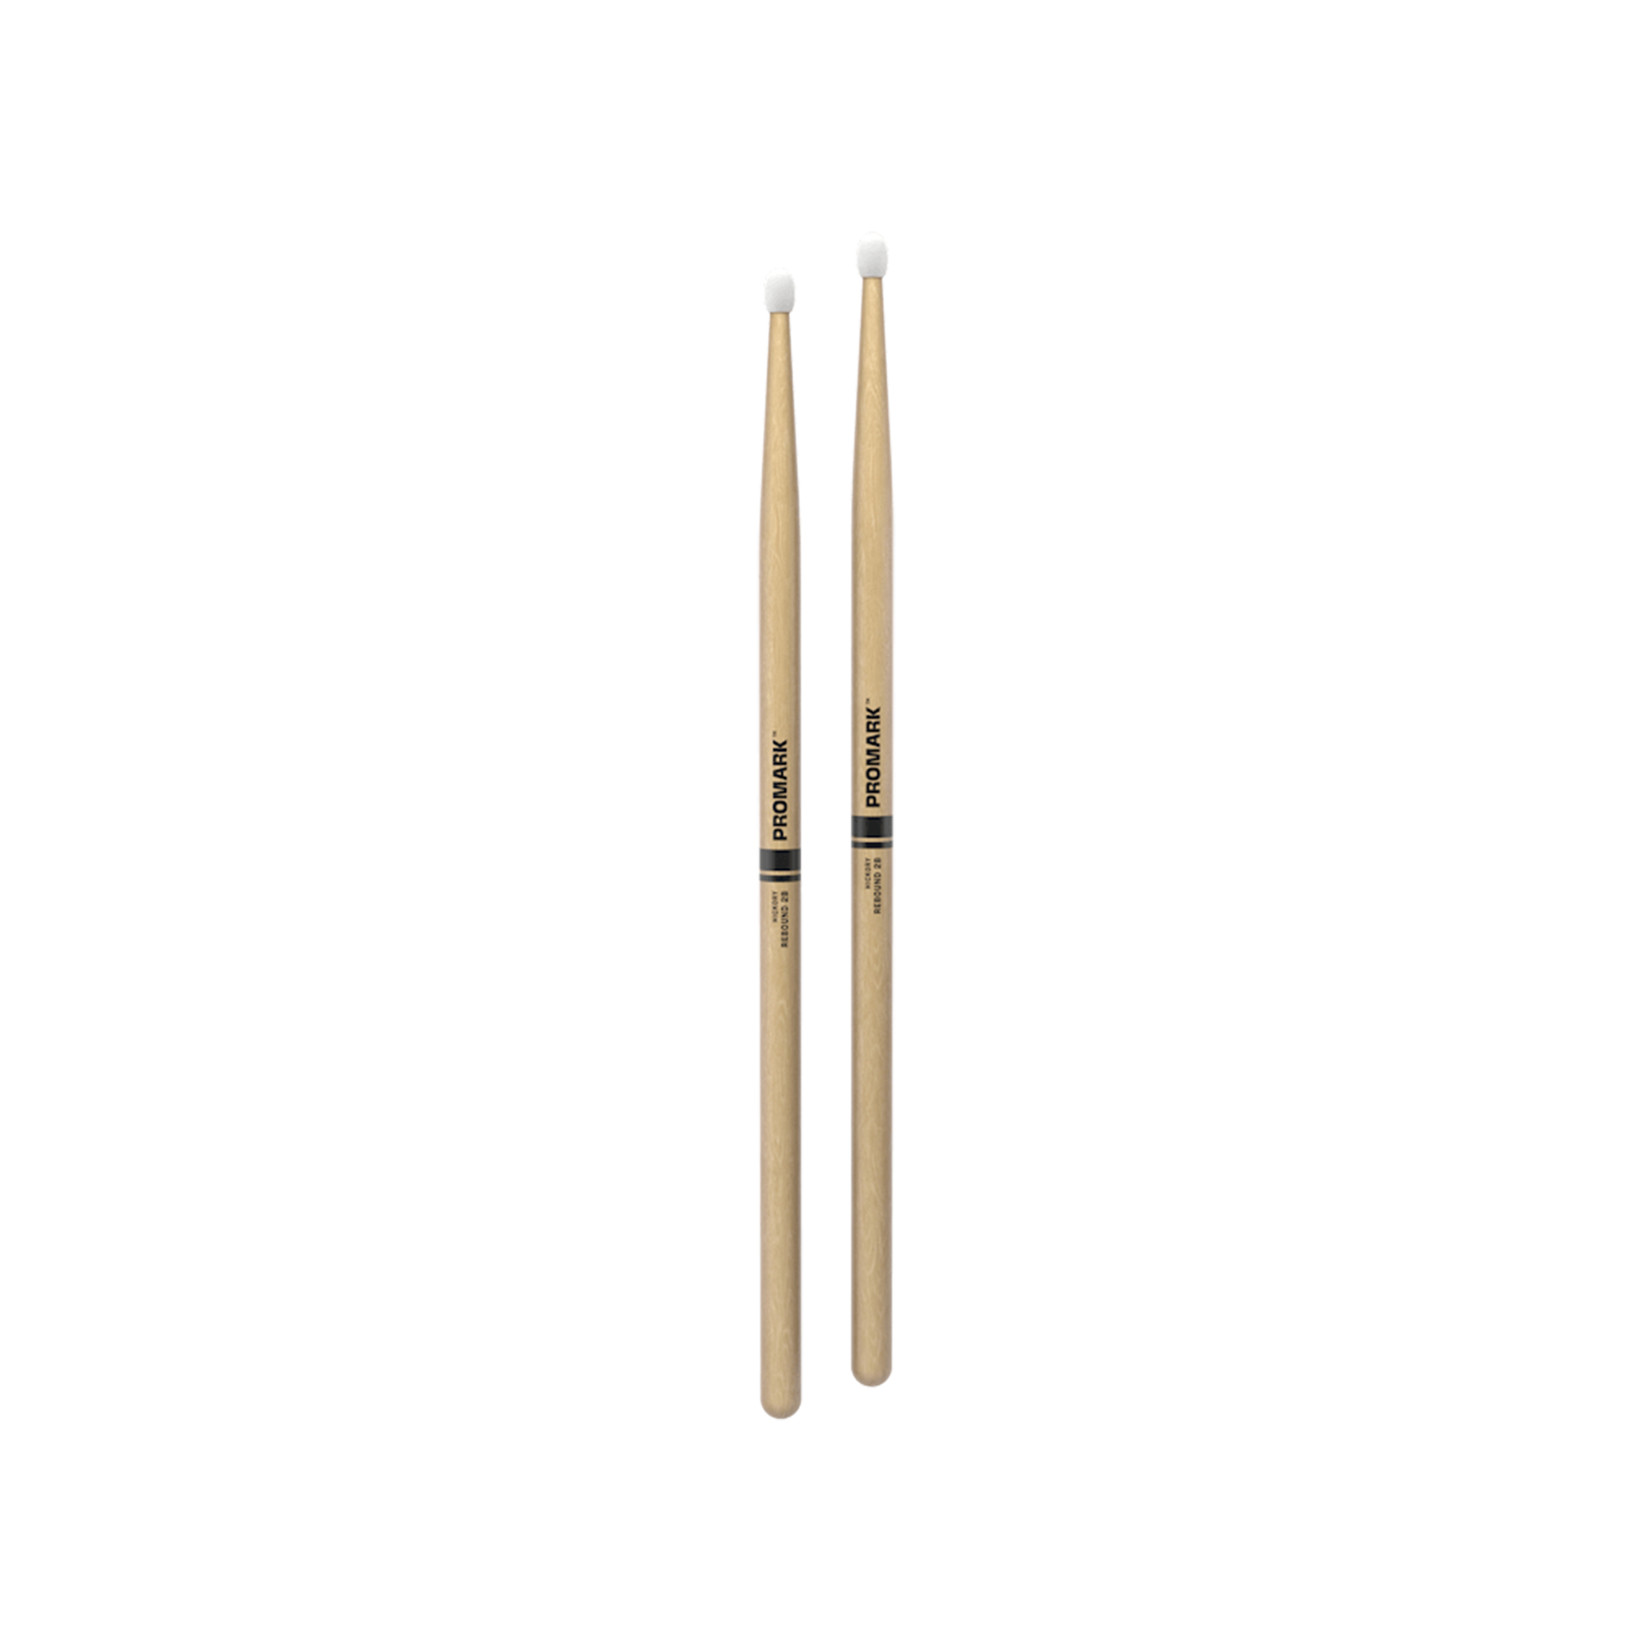 Promark ProMark Rebound 2B Hickory Nylon Tip Drumstick